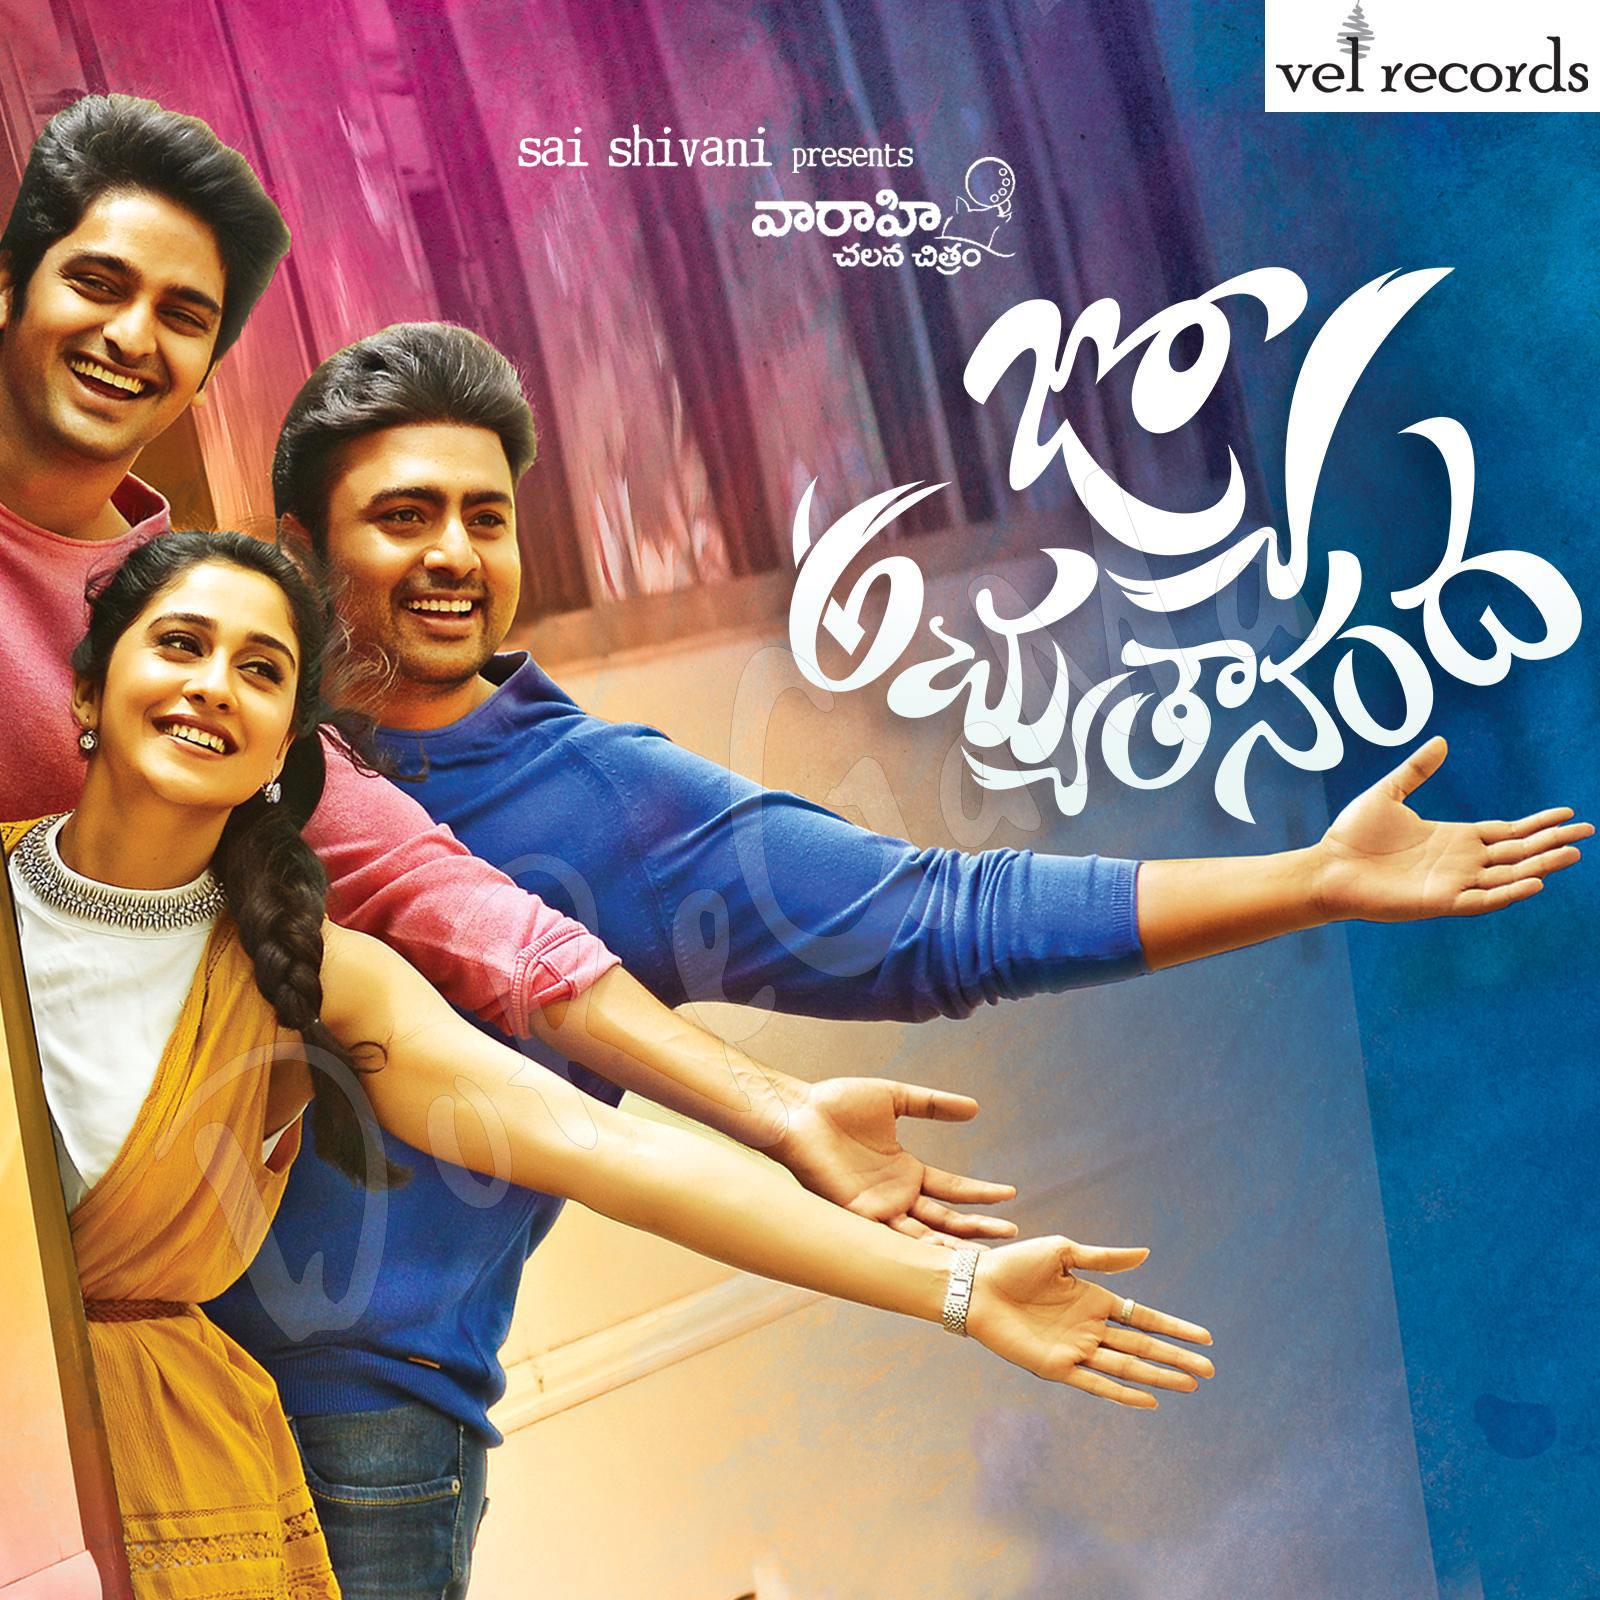 Jyo Achyutananda 2016 Telugu Movie CD Front Cover Poster Wallpaper